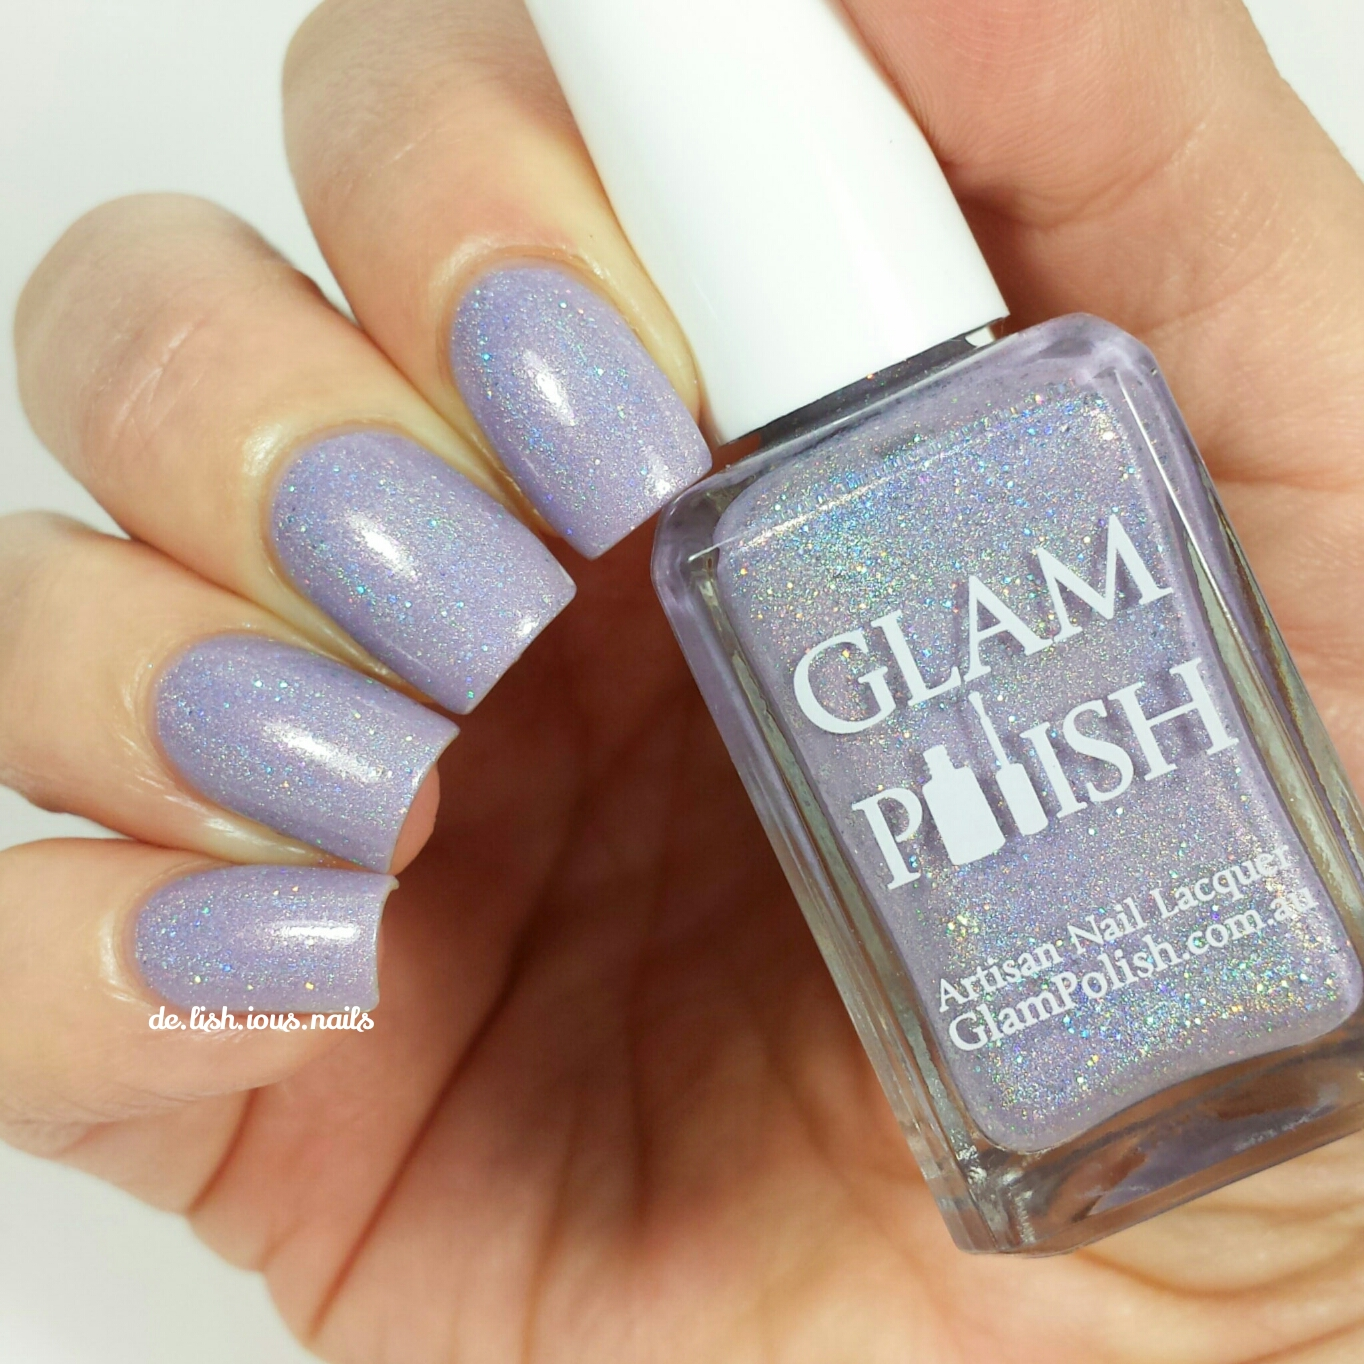 glam-polish-florals-for-spring-groundbreaking-3.jpg.jpeg